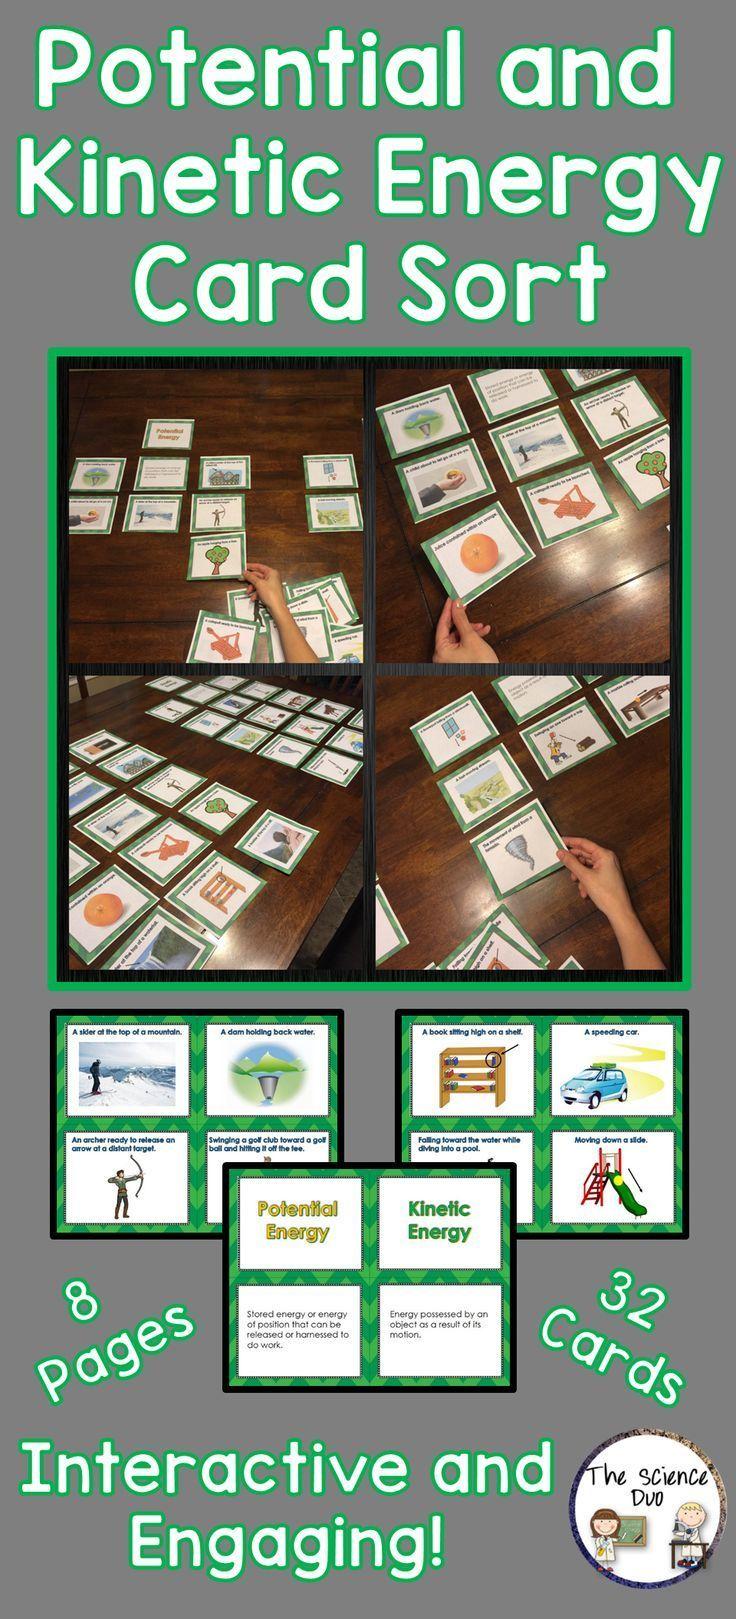 Workbooks solar energy worksheets for kids : Potential and Kinetic Energy Card Sort   Kinetic energy ...